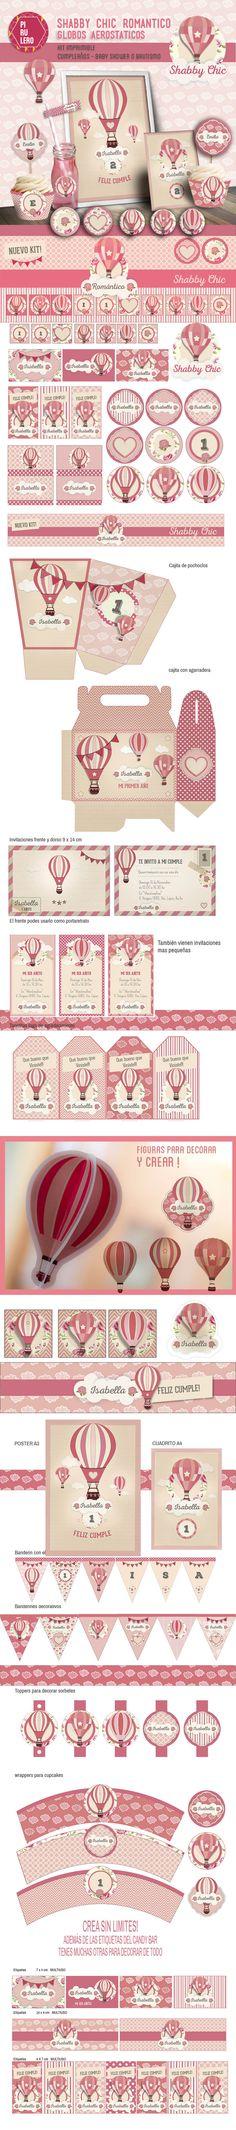 Kit imprimible Shabby chic romántico - Globos aerostaticos - rosas